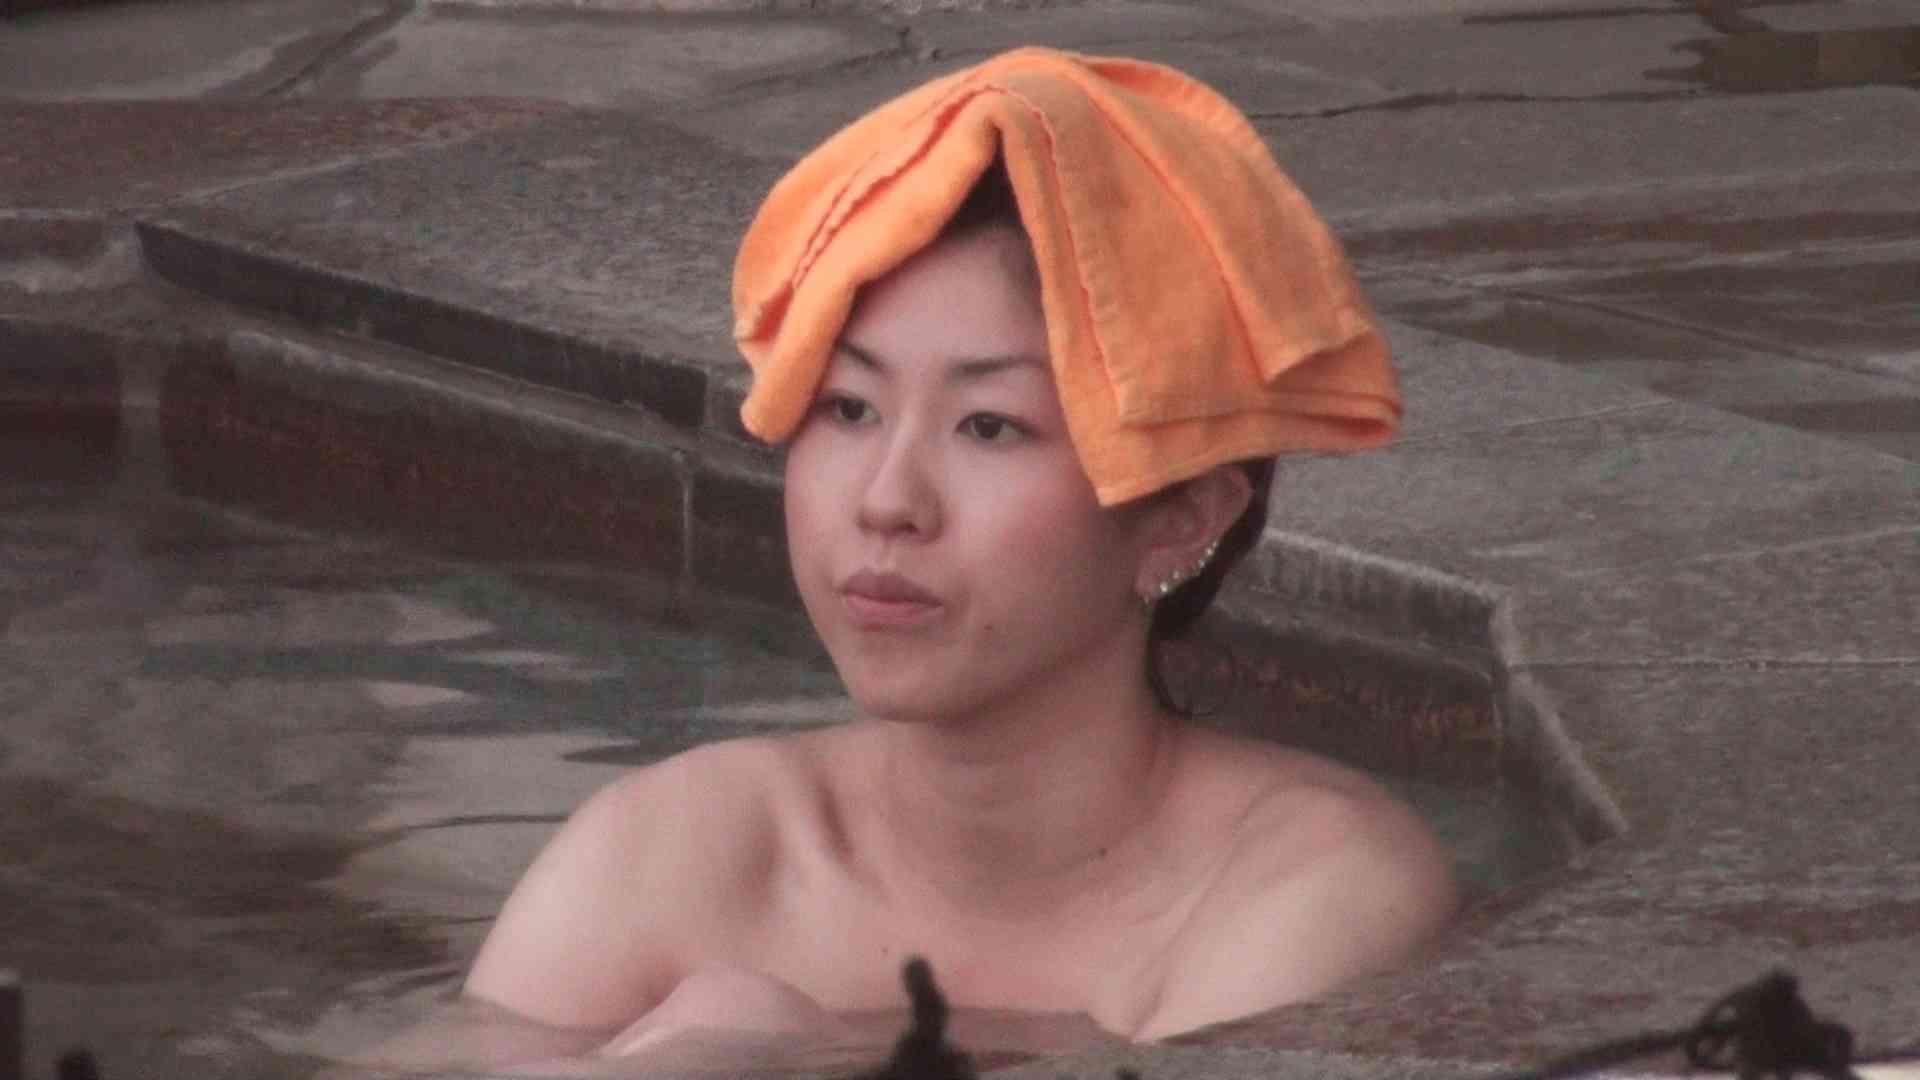 Aquaな露天風呂Vol.135 盗撮師作品  105pic 96